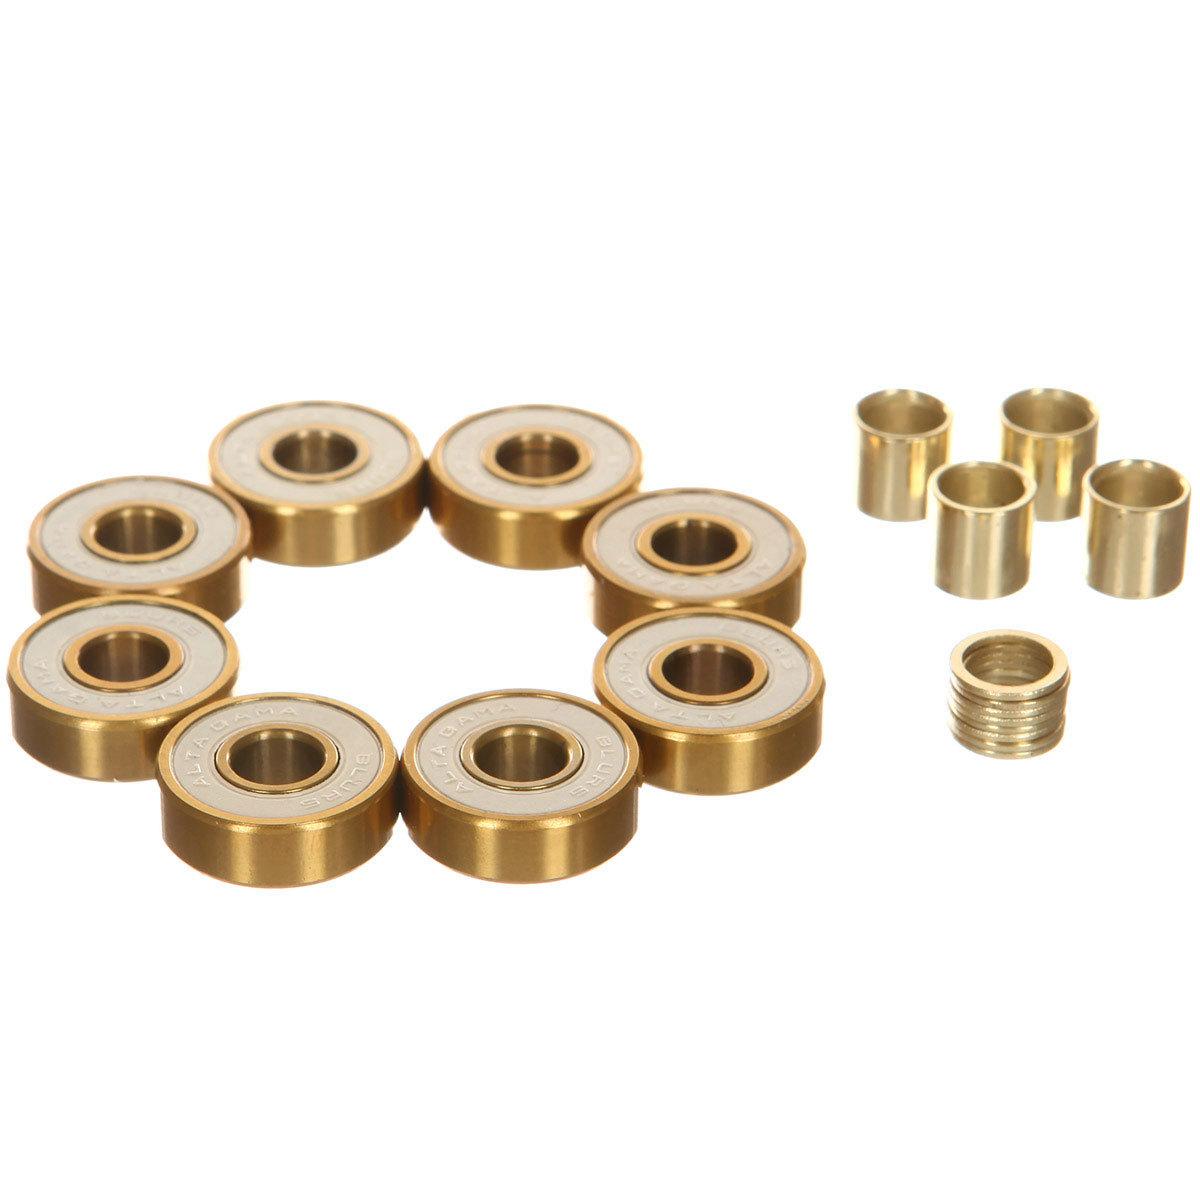 Подшипники для скейта BLURS Titanium Gold